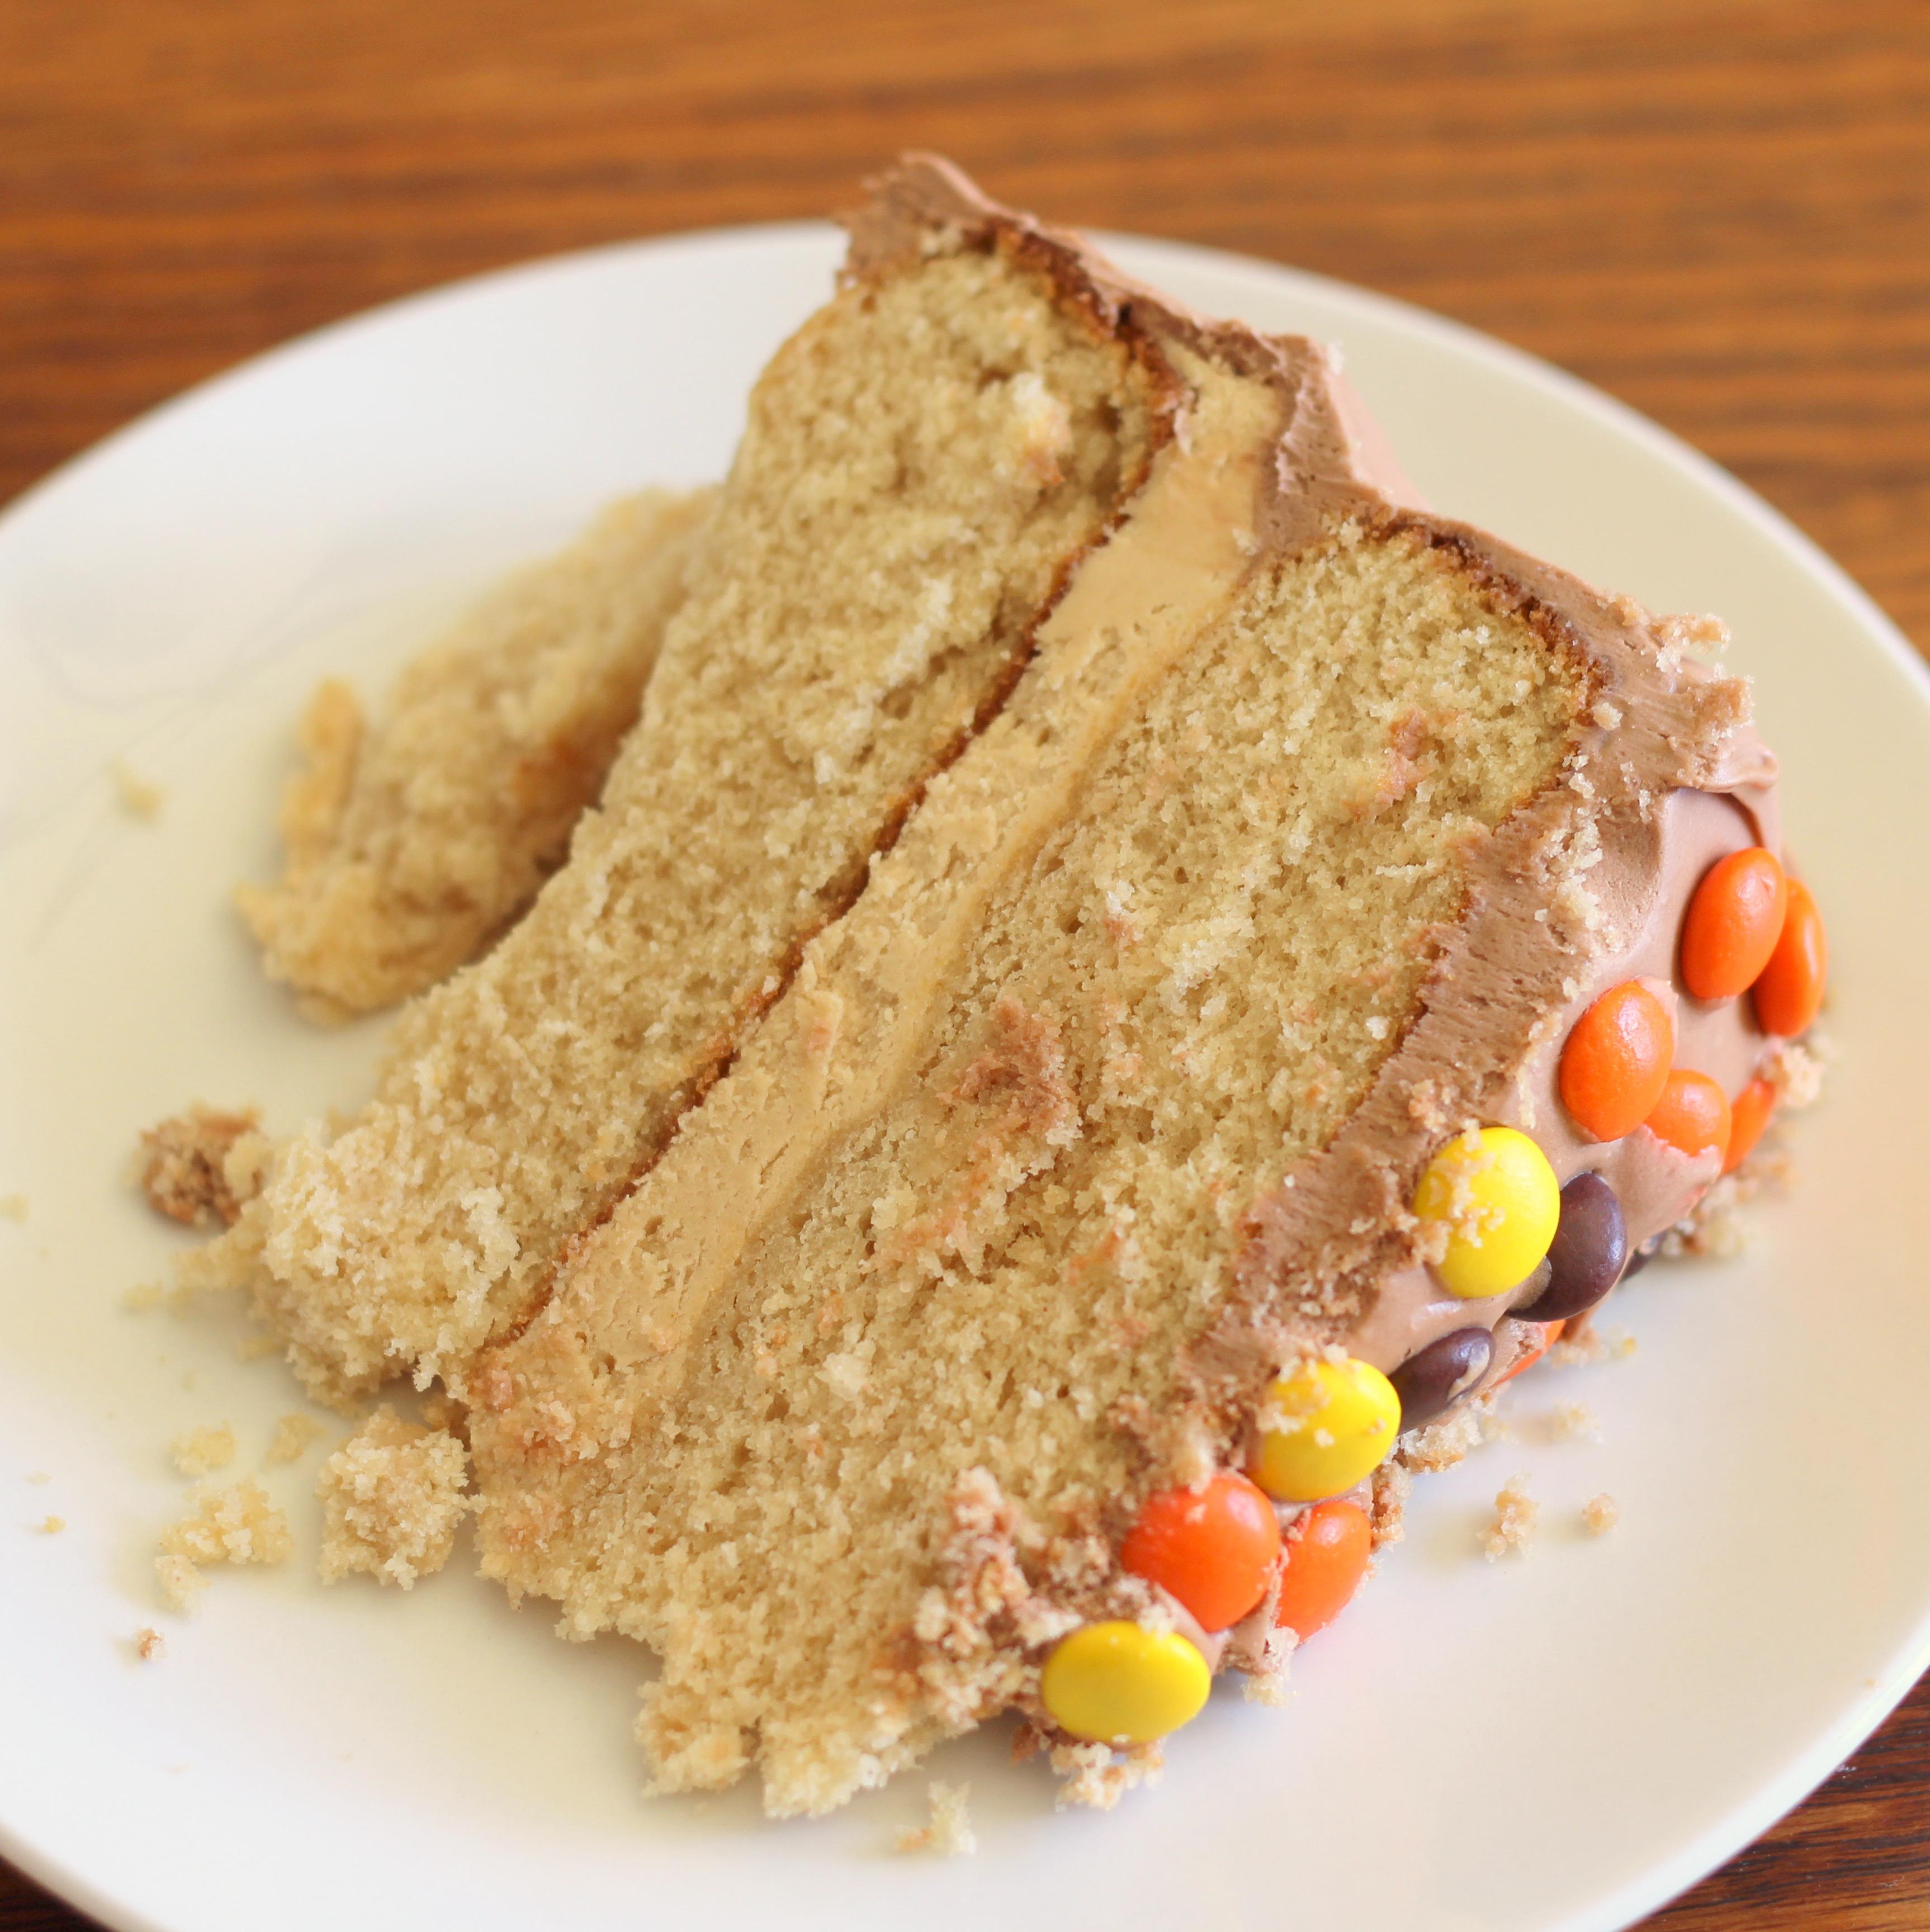 Peanut Butter and Chocolate Cake I